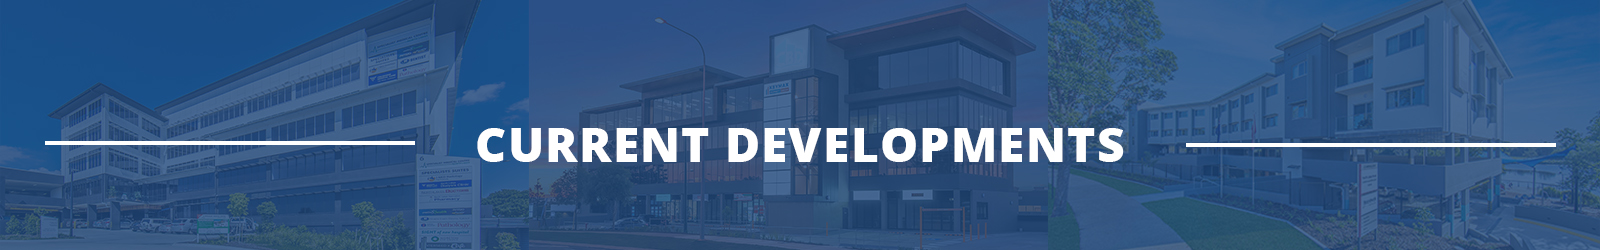 Current-developments-banner